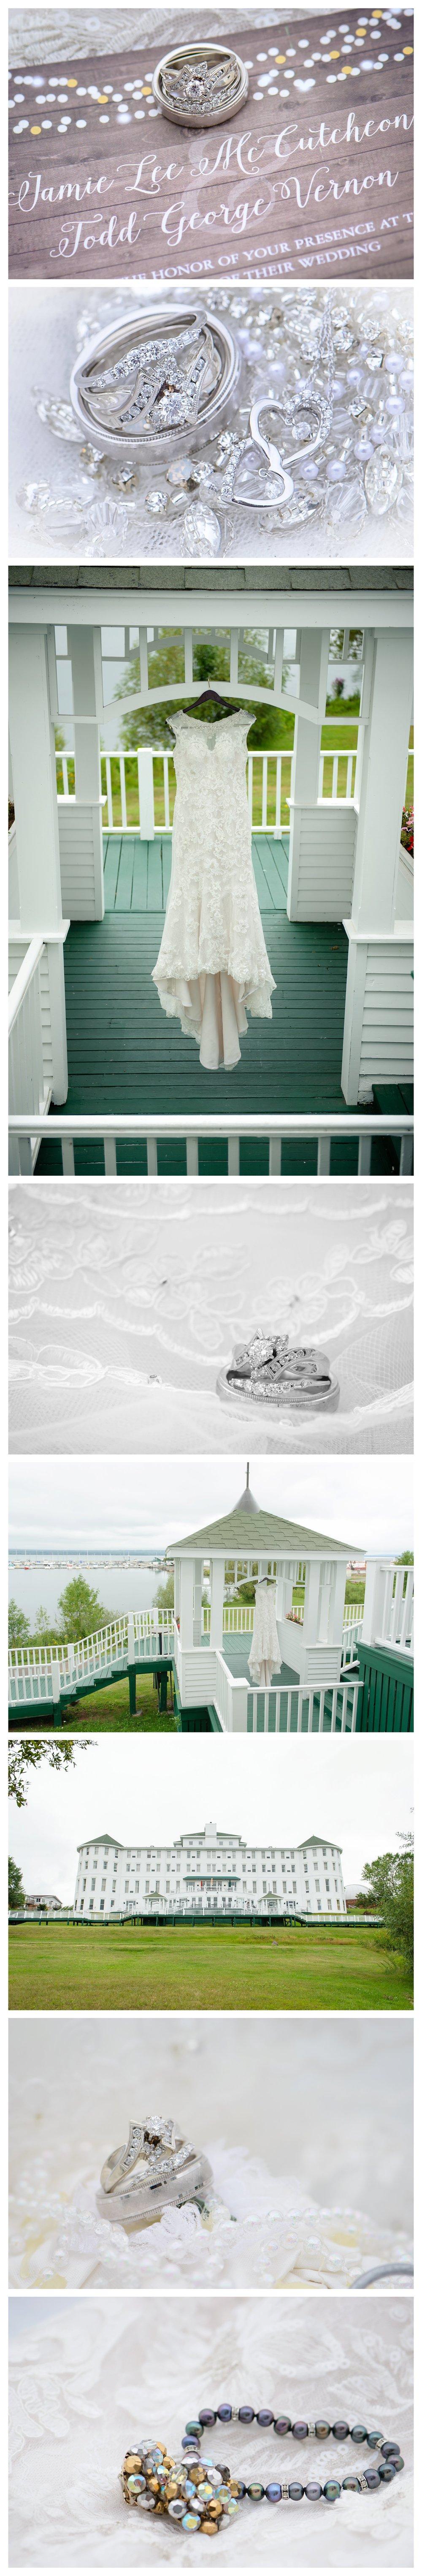 ps 139 photography jen jensen ashland freehands farm wedding northwoods_0020.jpg